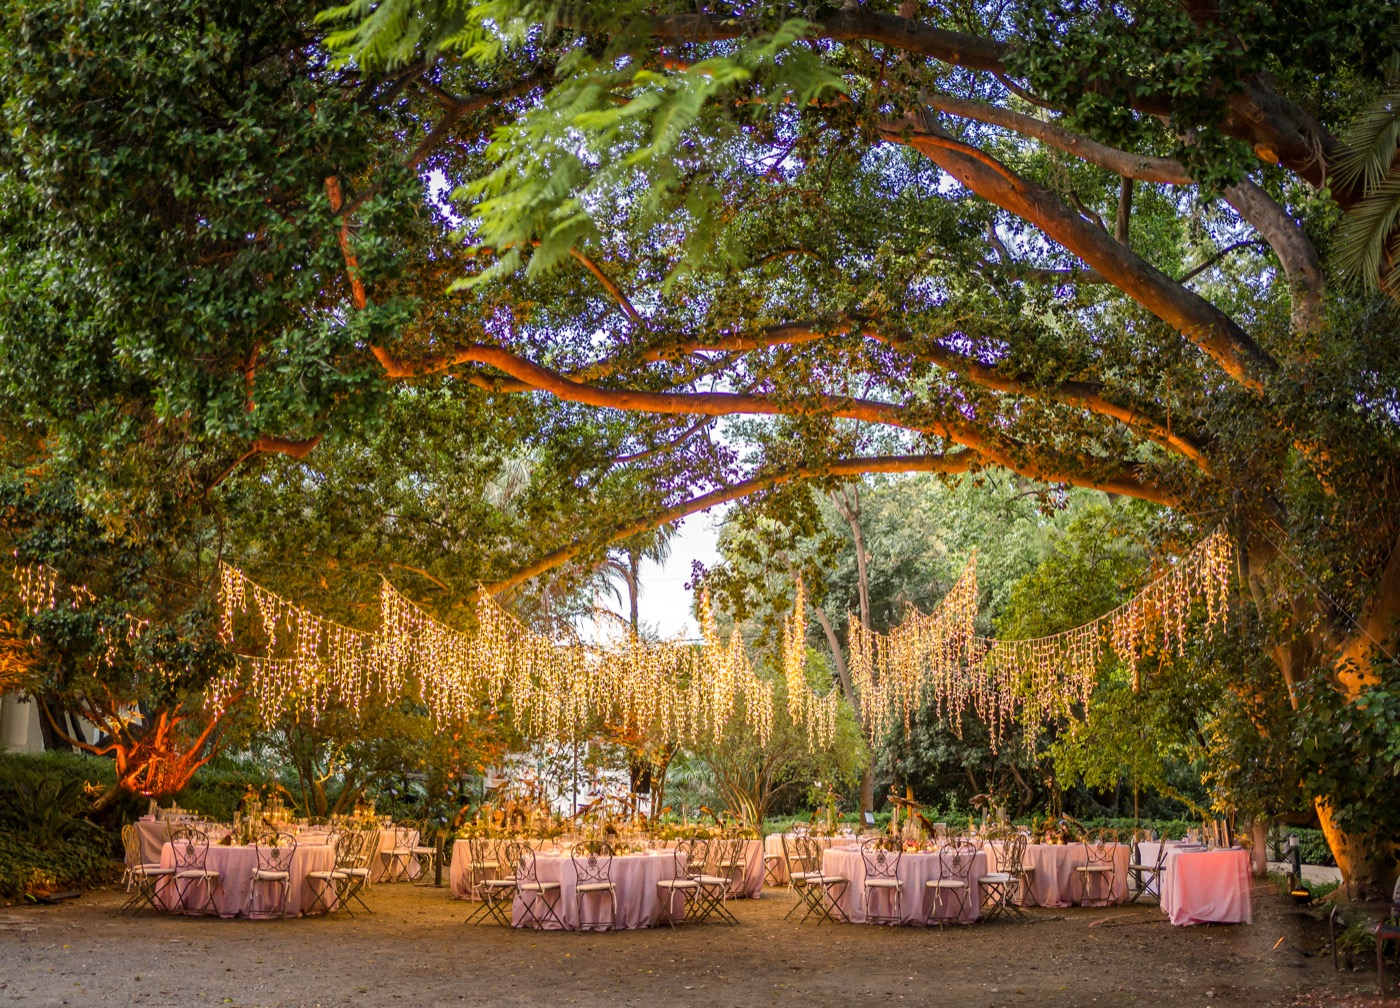 00210Luxury-Wedding-Planner-Spain- Sira-Antequera